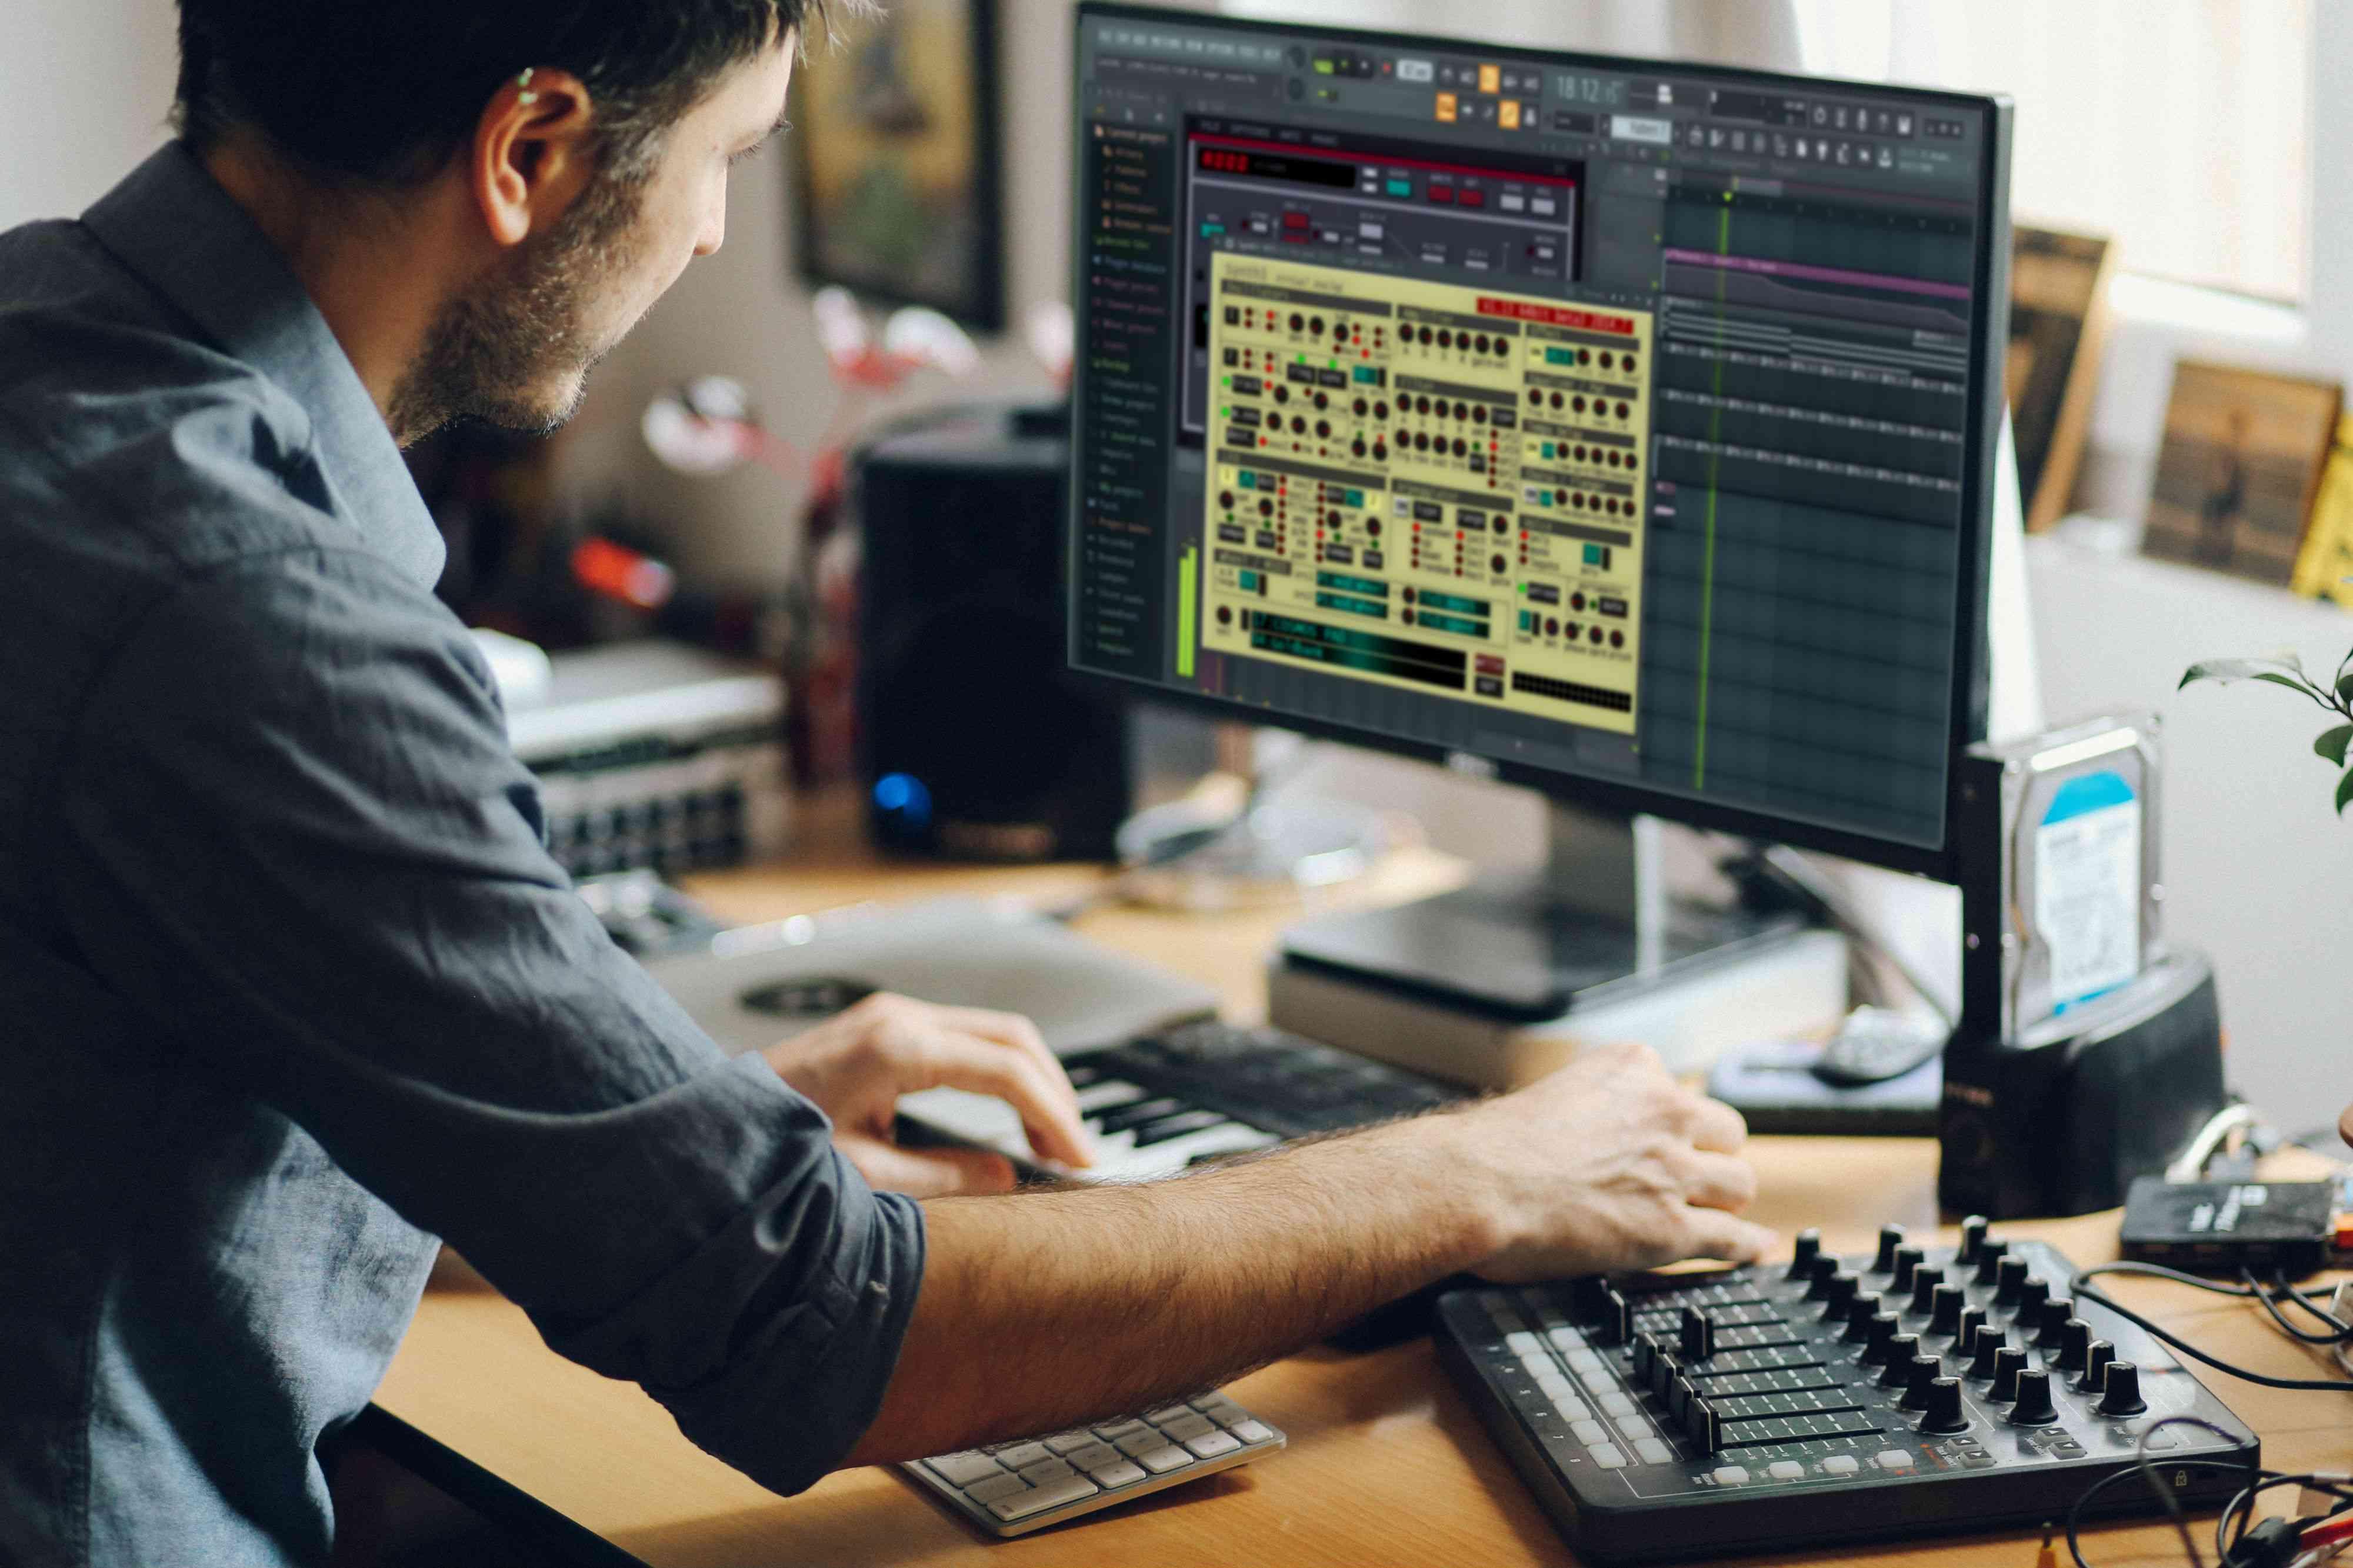 A man using VST plug-in with FL Studio.